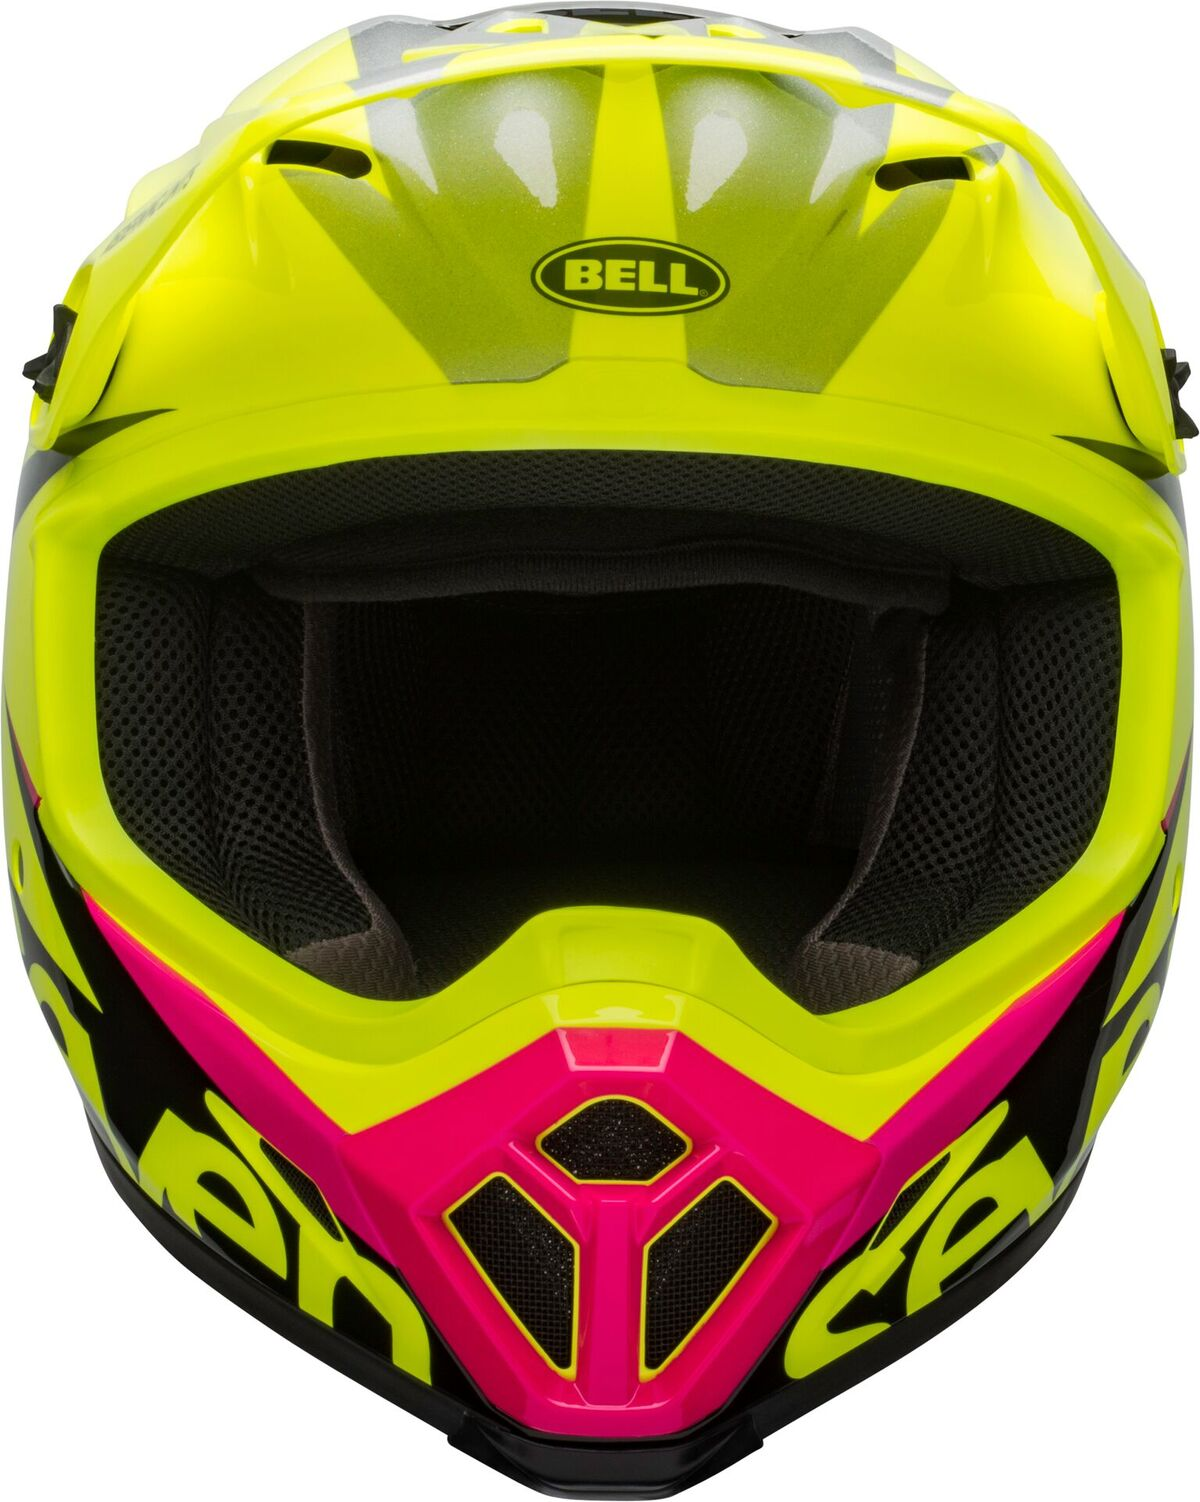 bell helmets mx 9 mips dirt helmet seven ignite gloss flo yellow